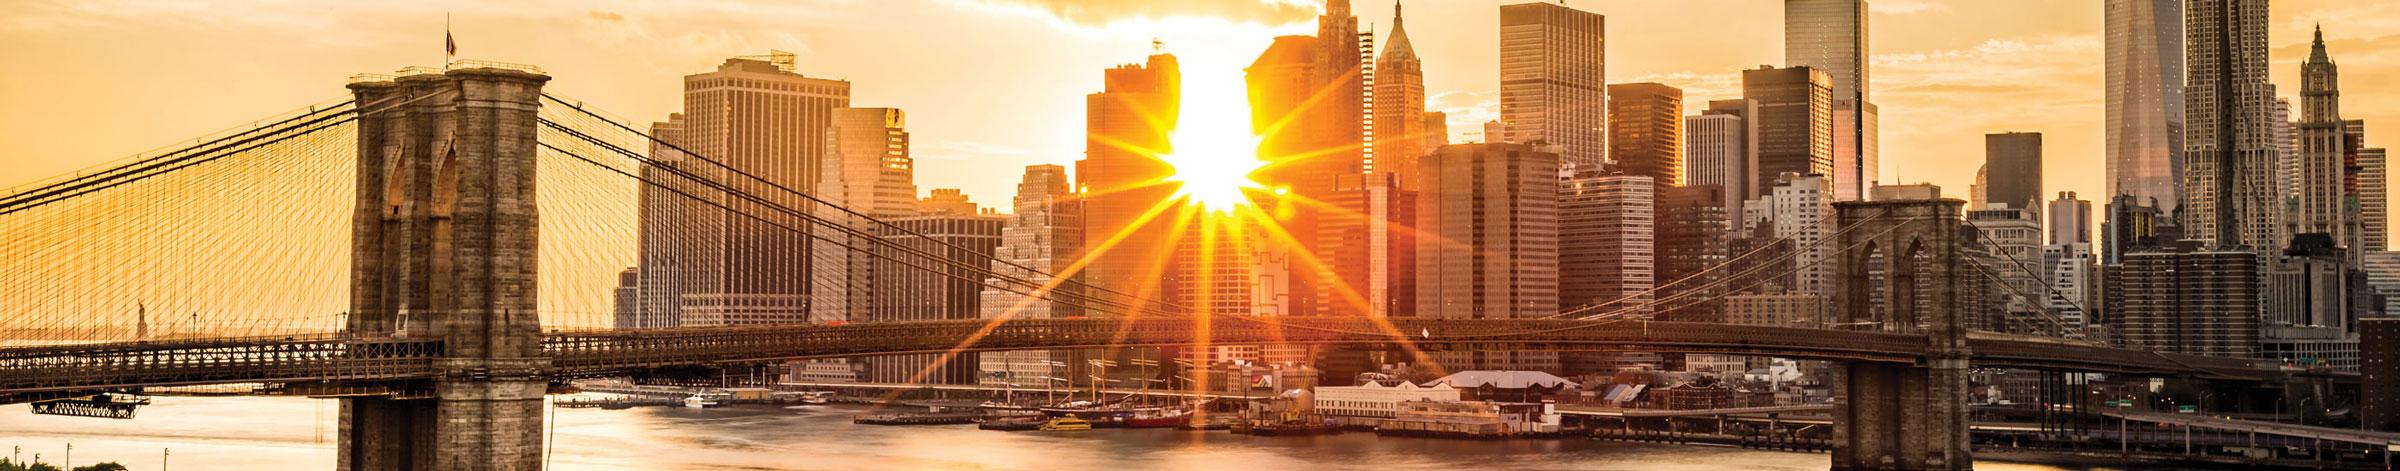 bridge leading into New York City at sunrise